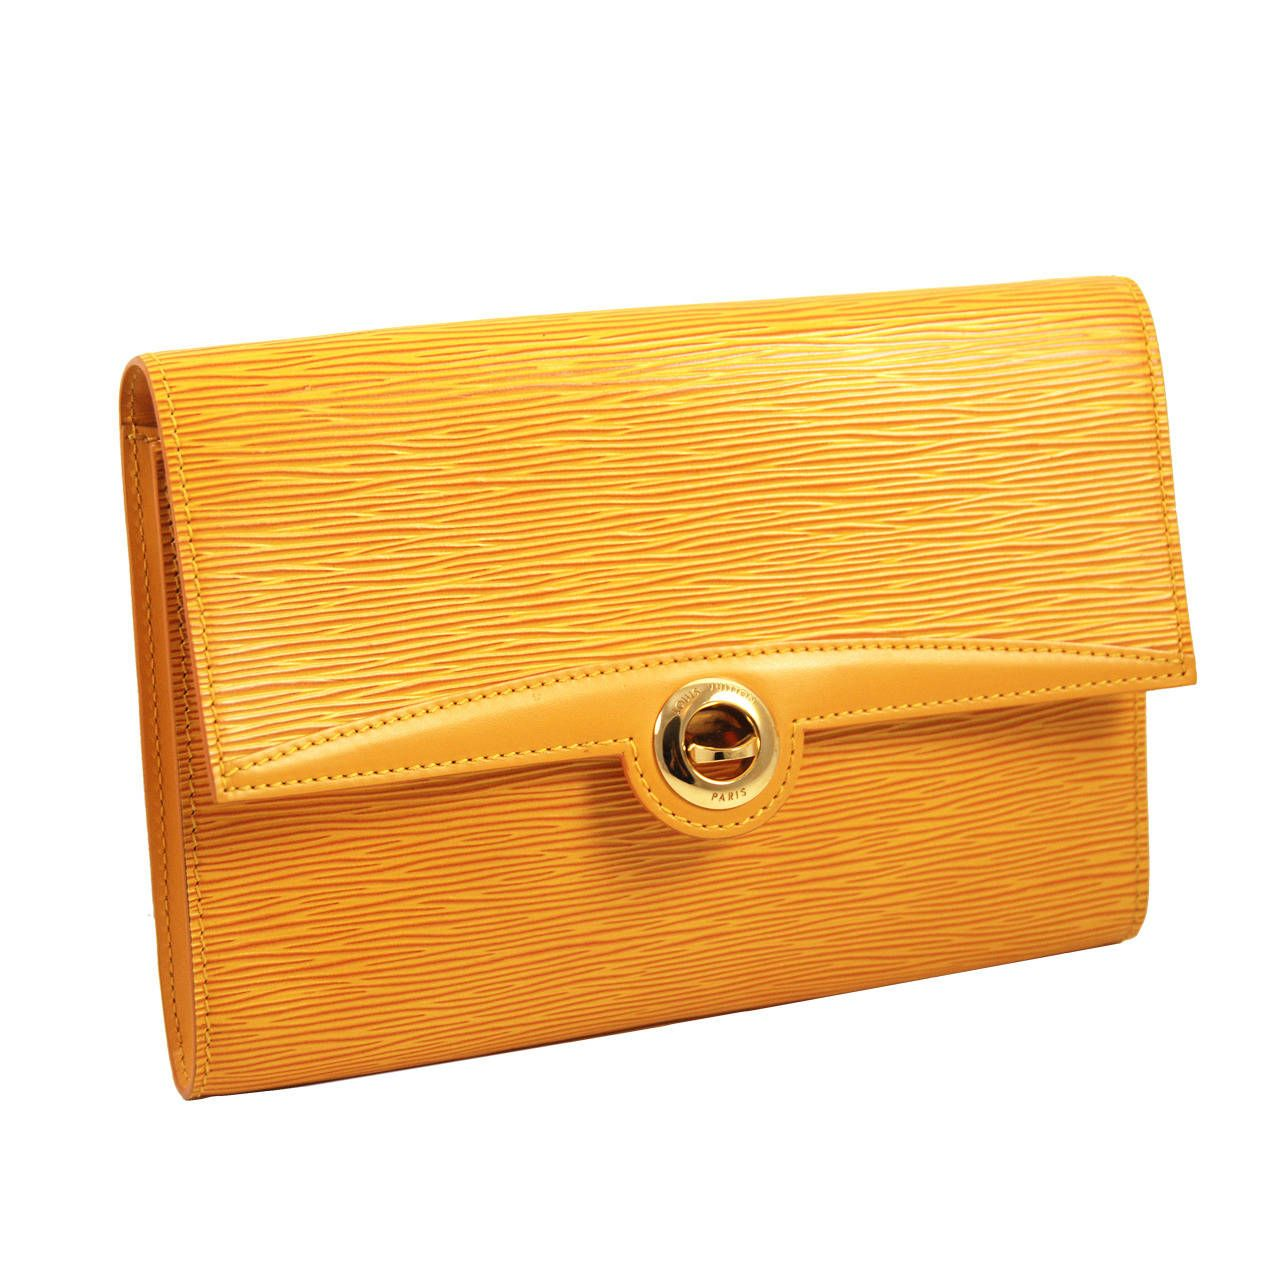 dd34e462726d Louis Vuitton Mustard Yellow Epi Leather Arche Clutch